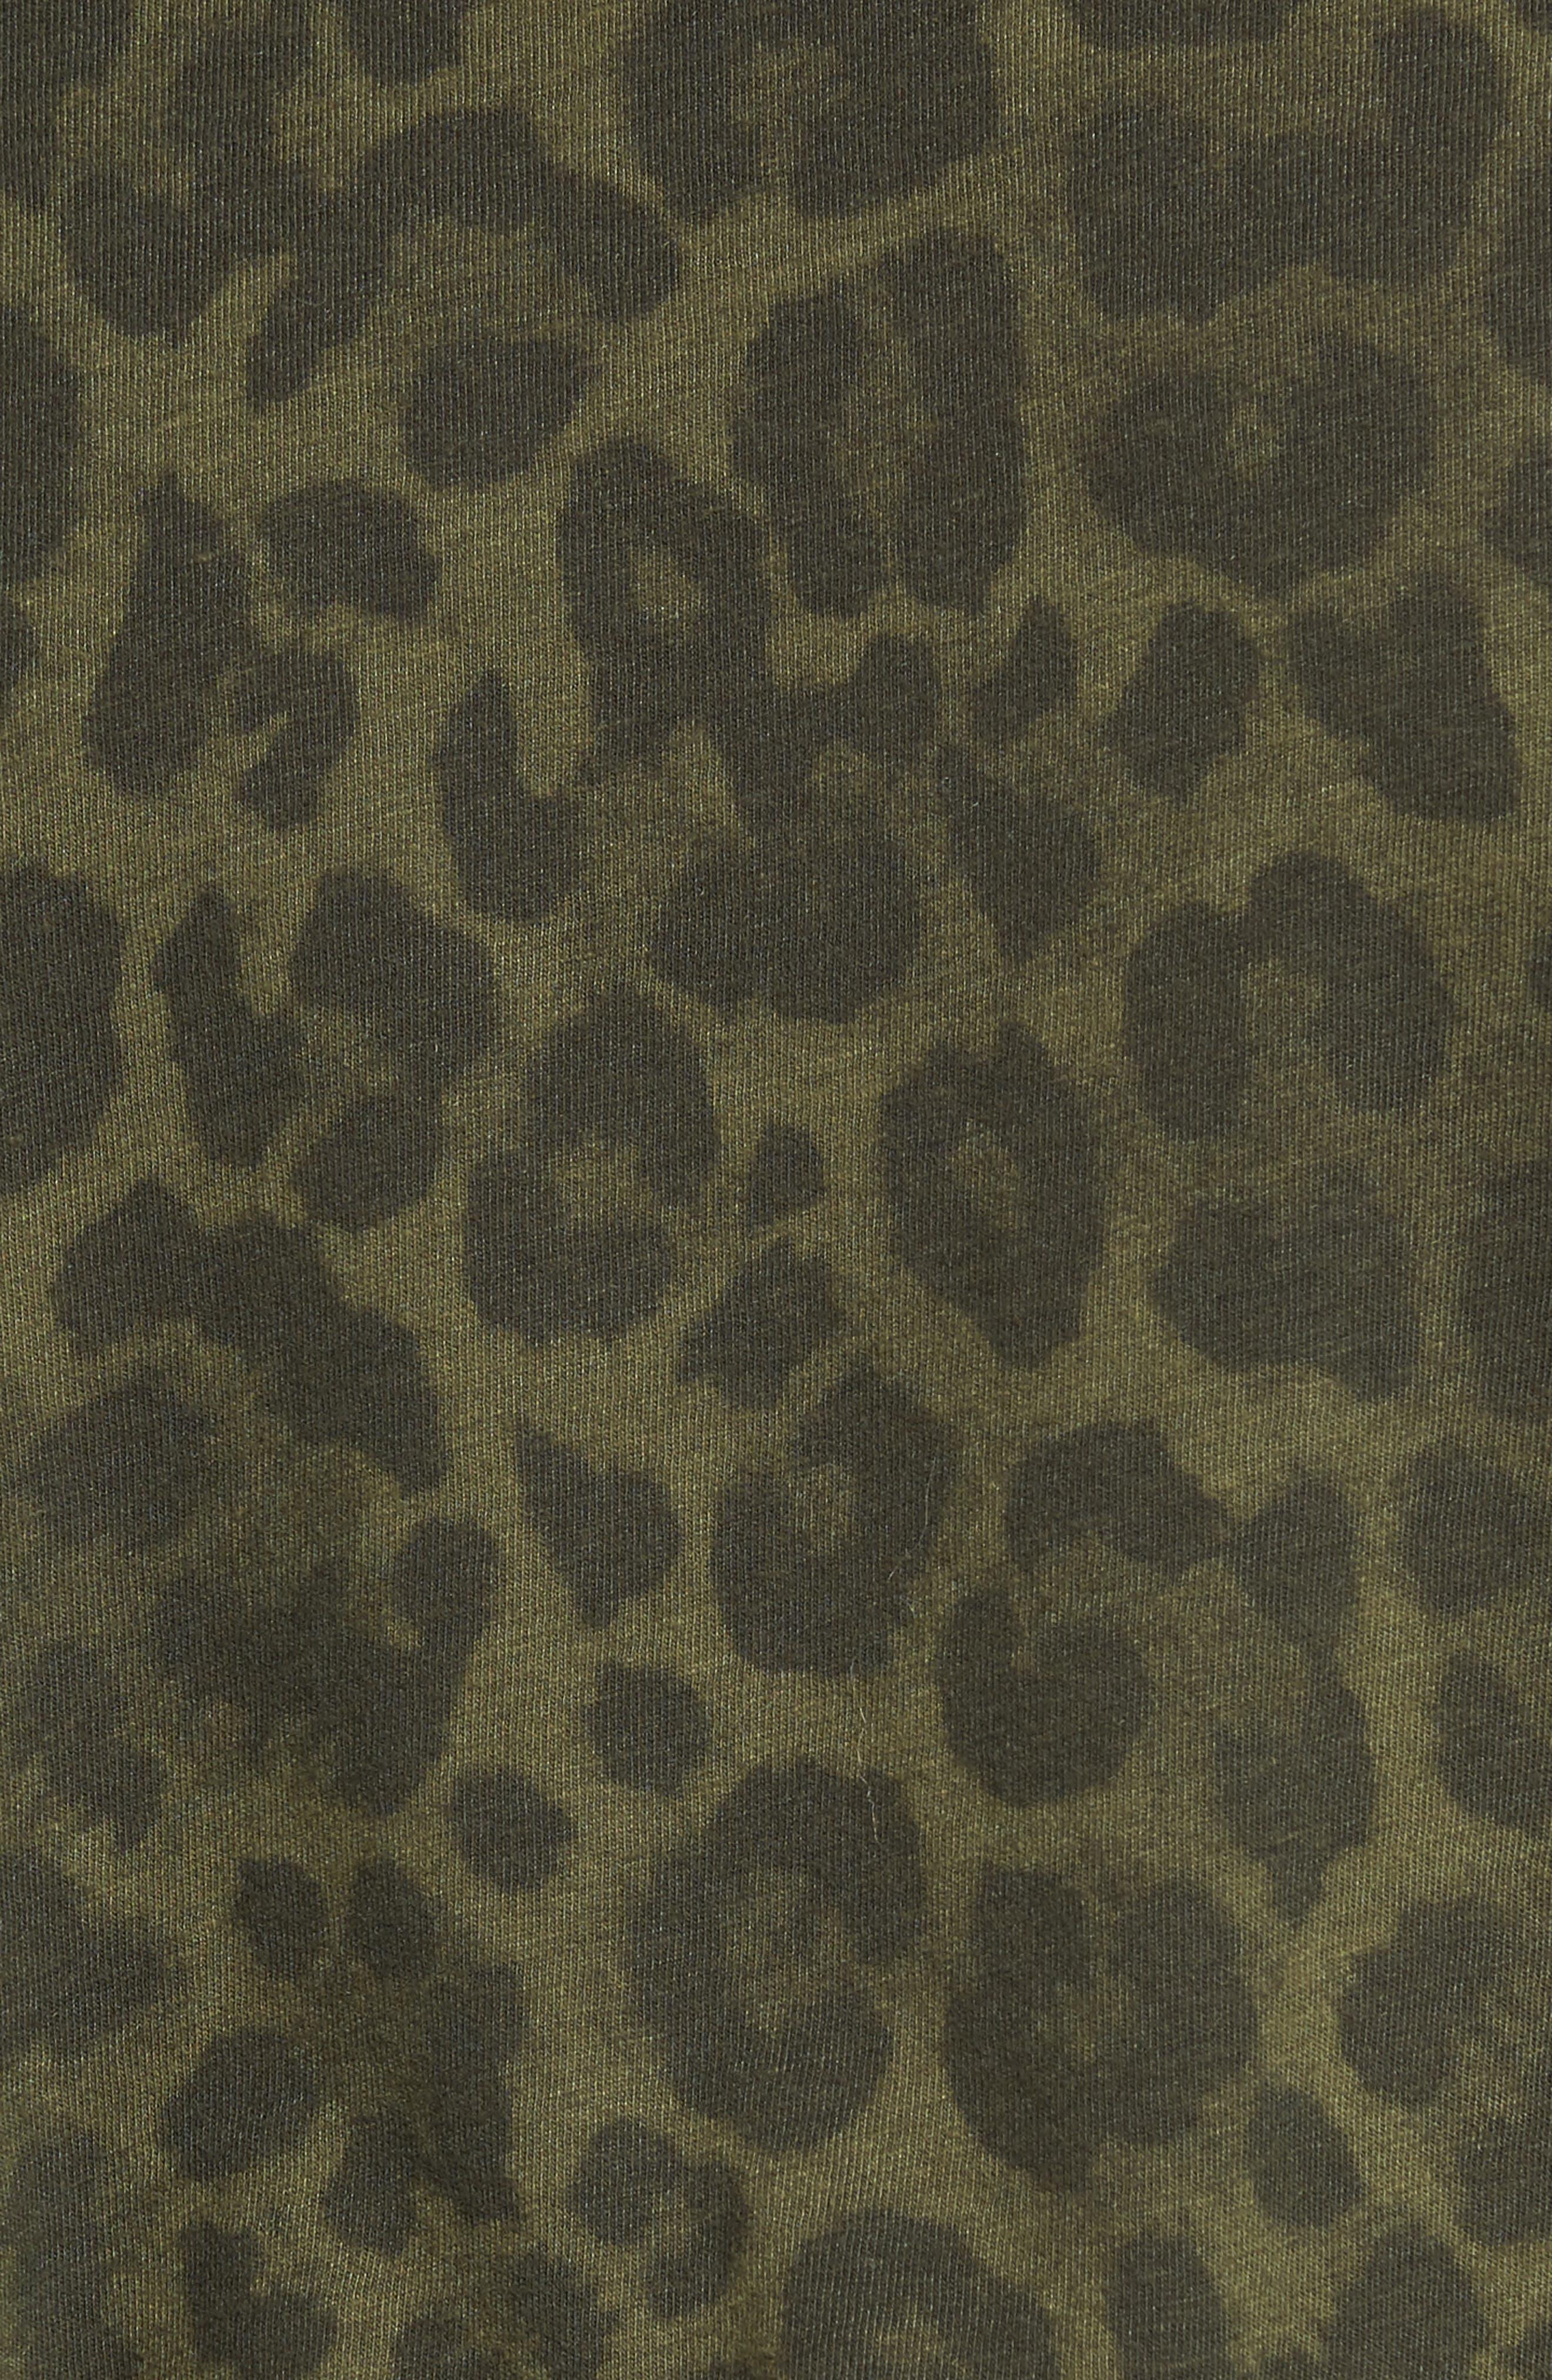 Leopard Print Tee,                             Alternate thumbnail 5, color,                             317